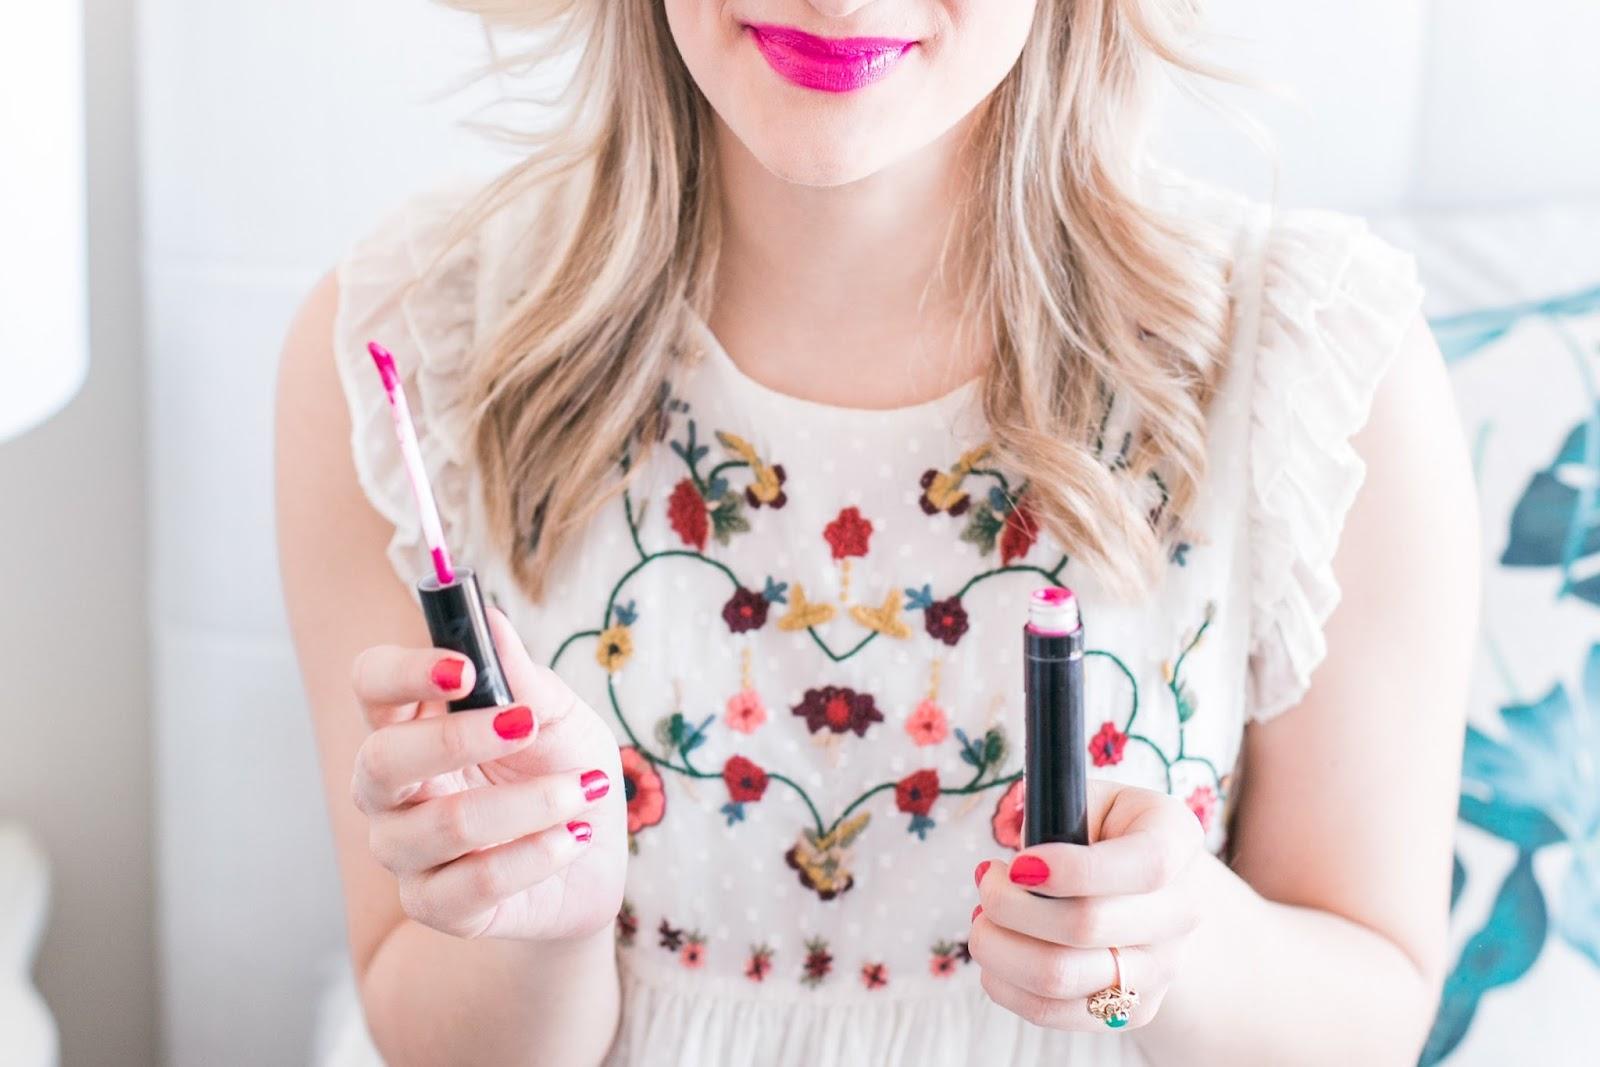 5 Pink Buxom Va-Va-PLUMP Shiny Liquid Lipsticks To Try This Spring - Dare Me Shade